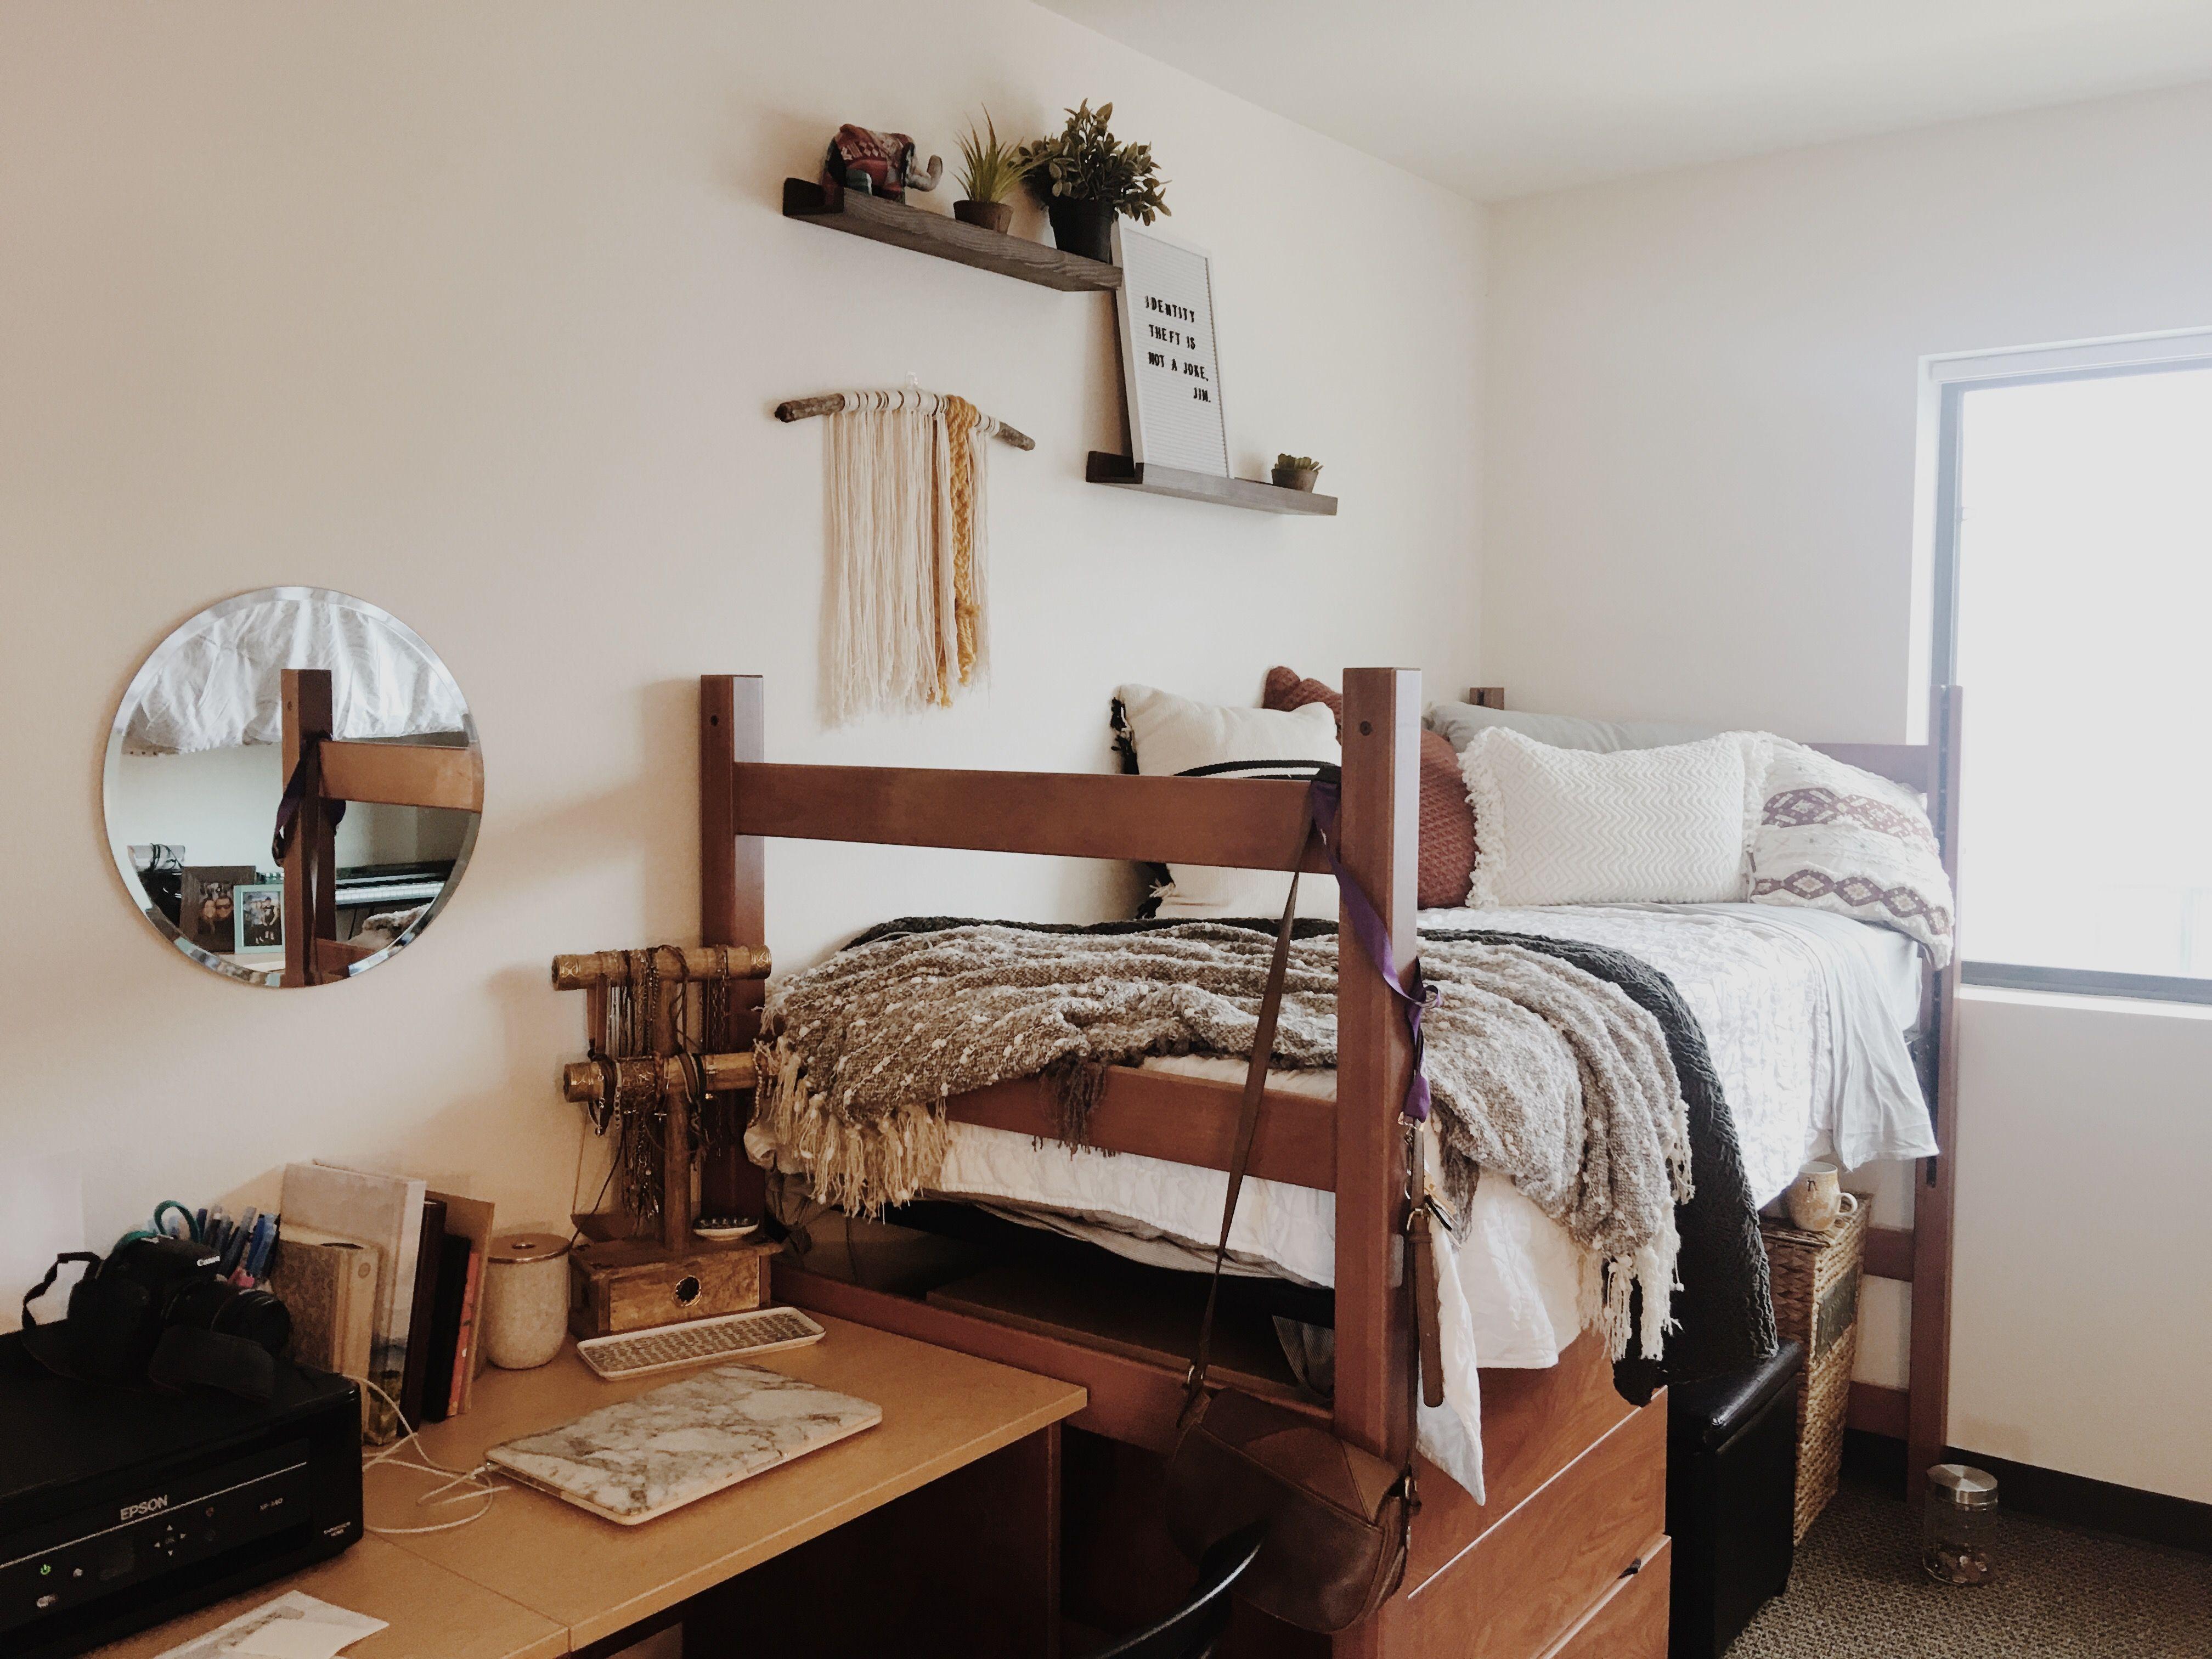 Dorm room | @hann.elaine | College apartment decor ...